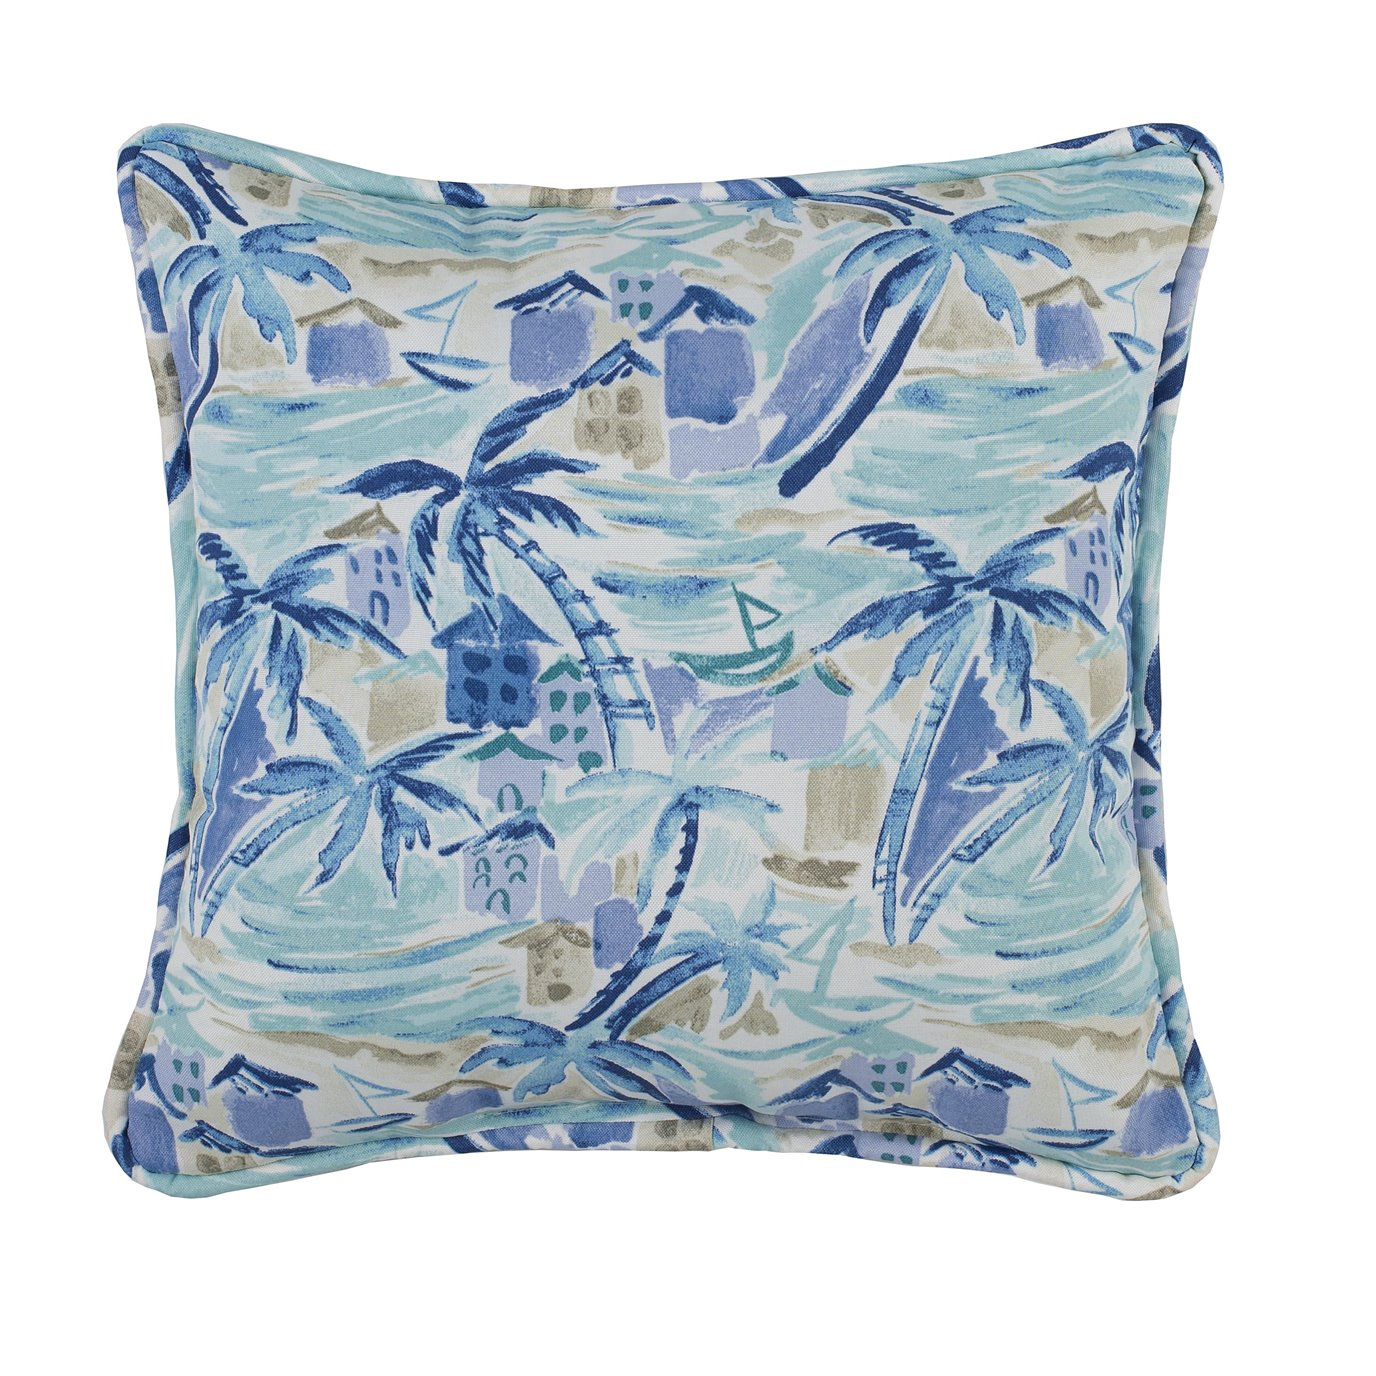 Tropical Paradise Blue Square Pillow - Main Print